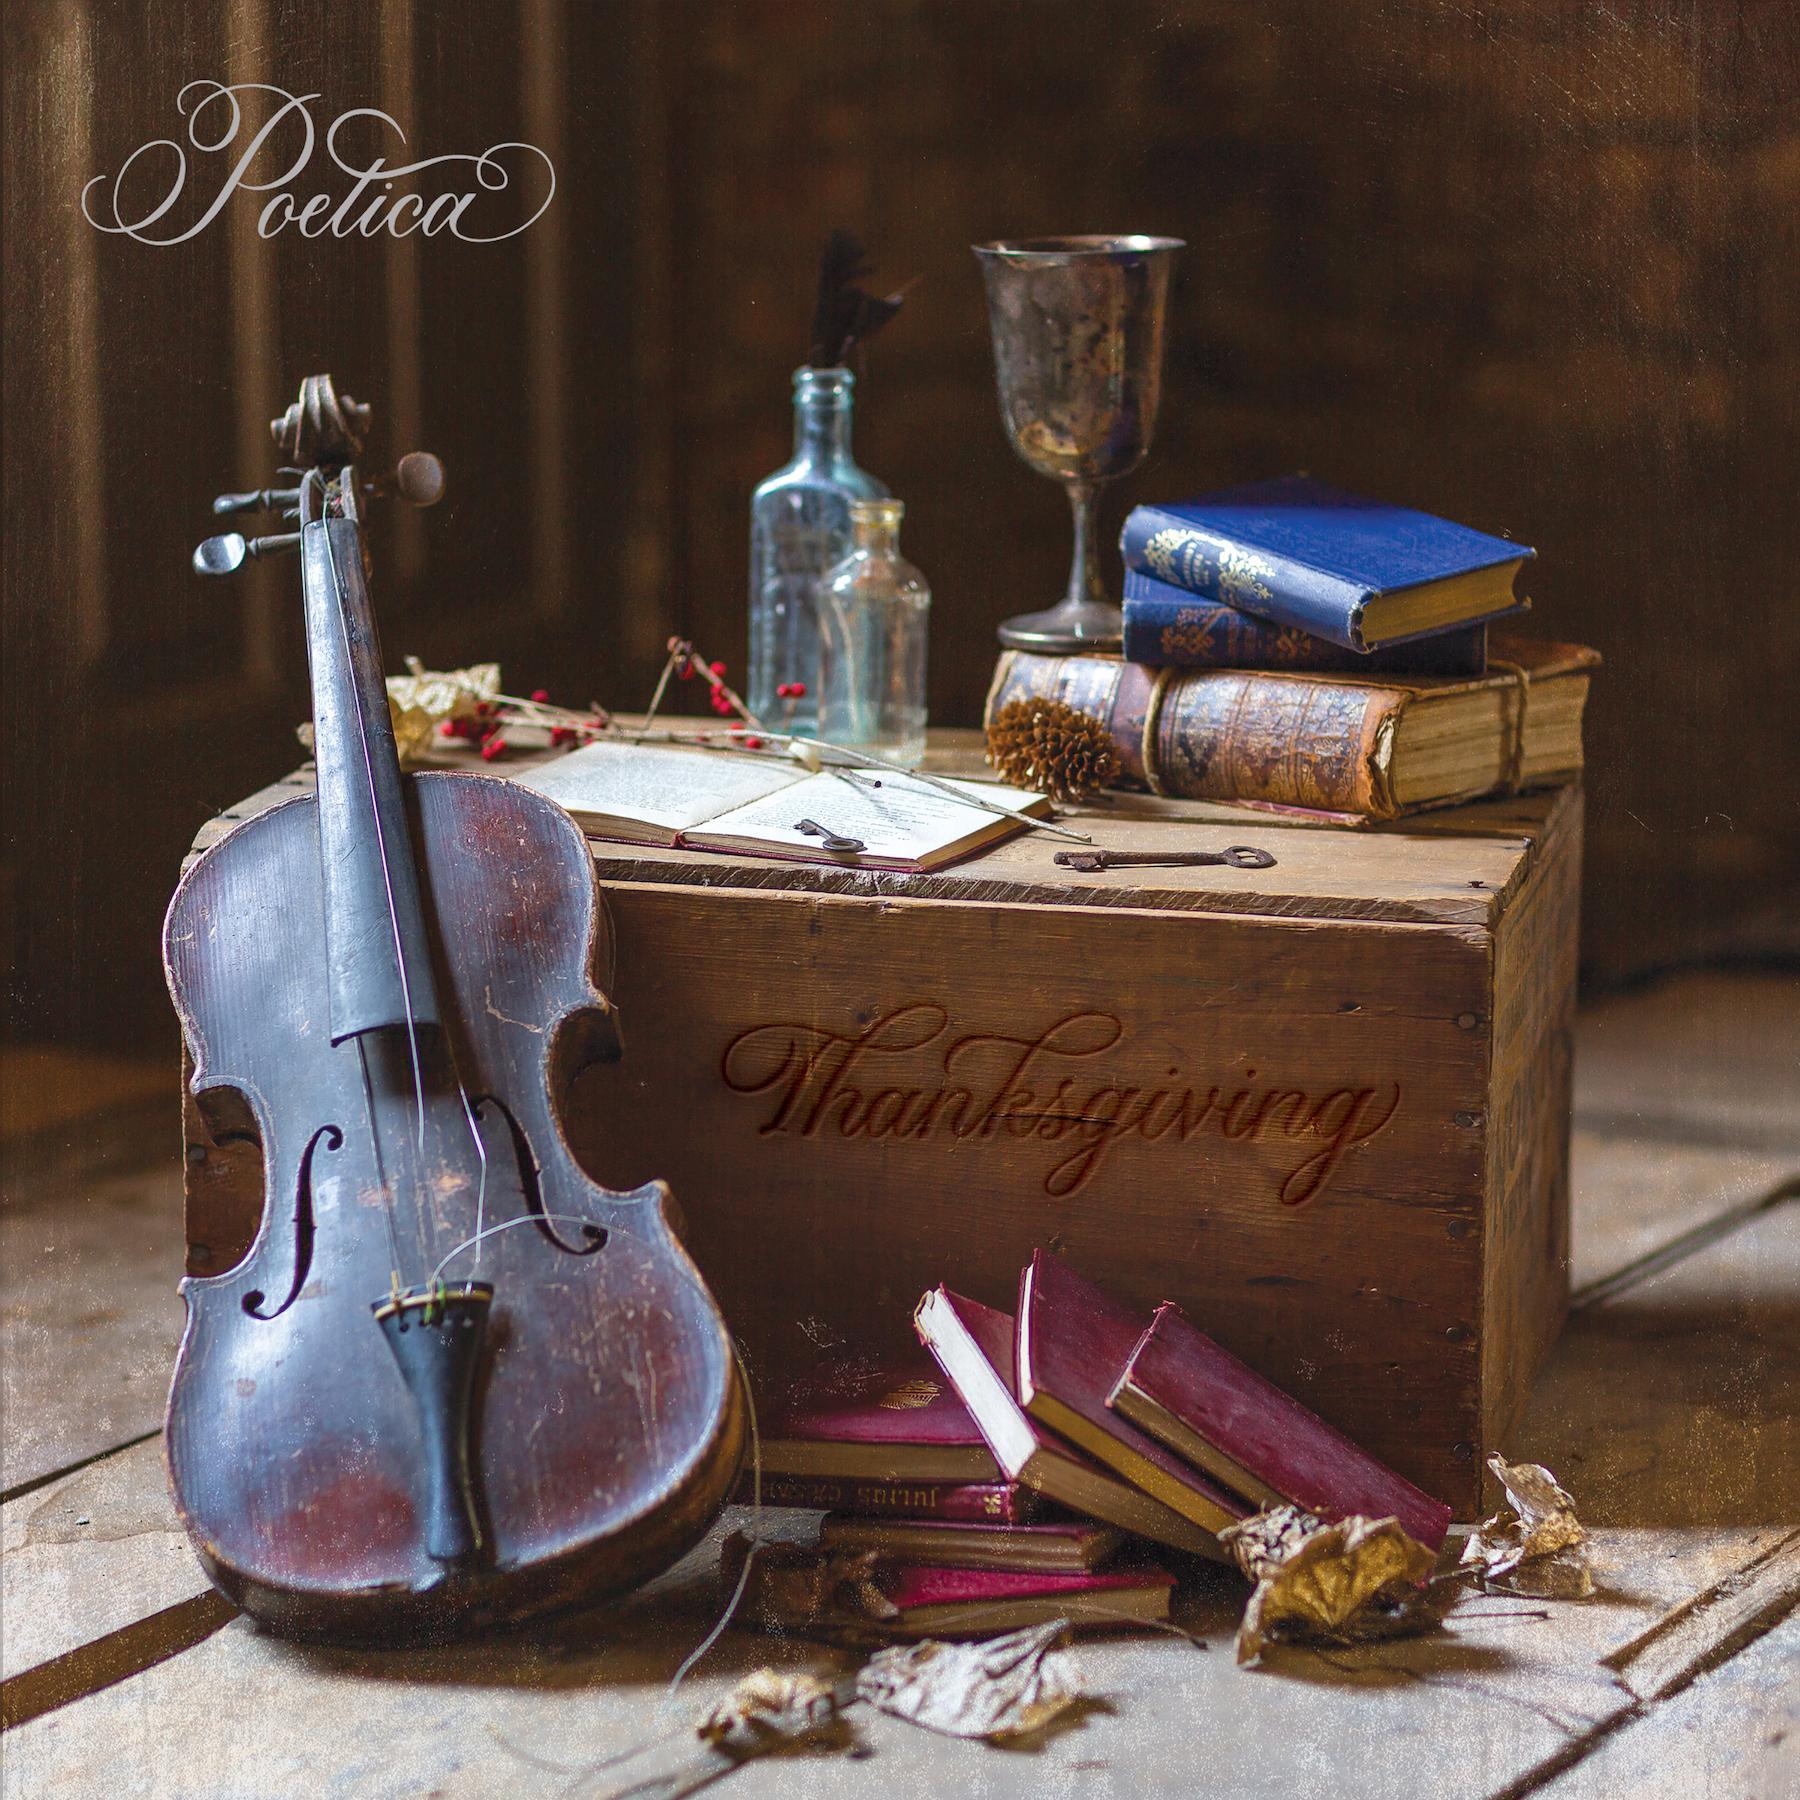 Poetica - Thanksgiving